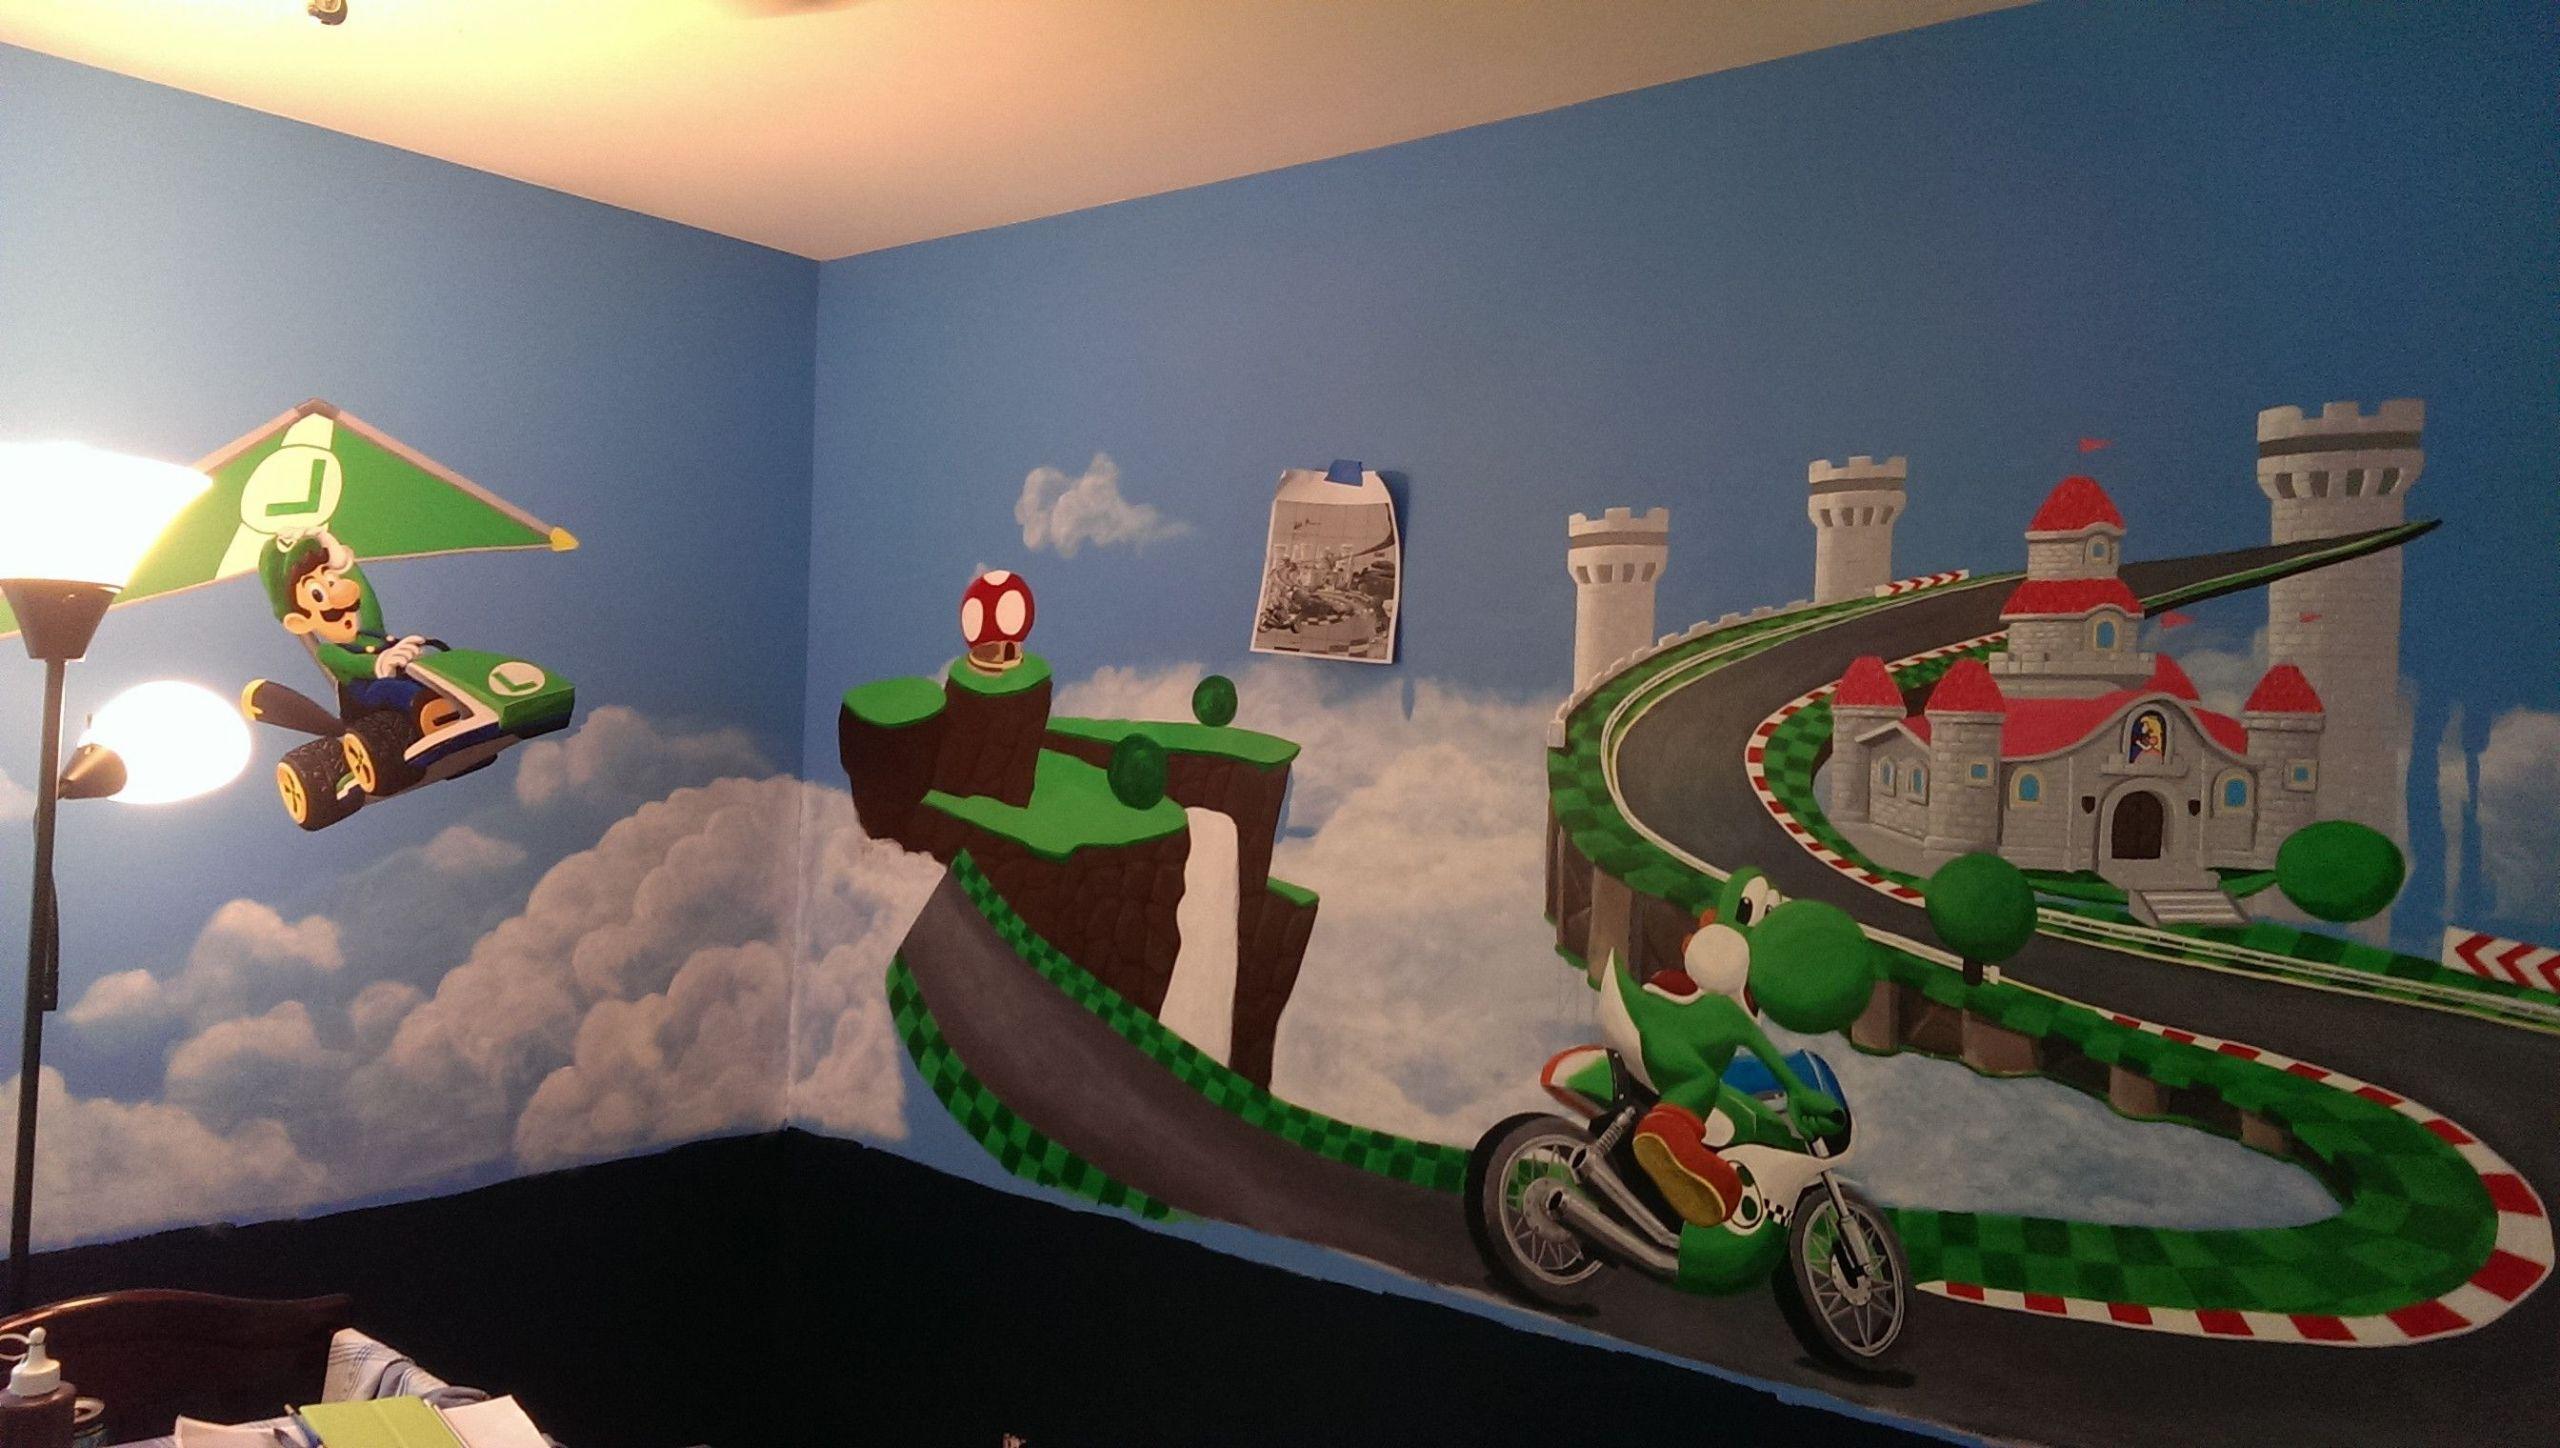 Baby Room Decoration Game  Mario Kart 8 themed Baby Nursery